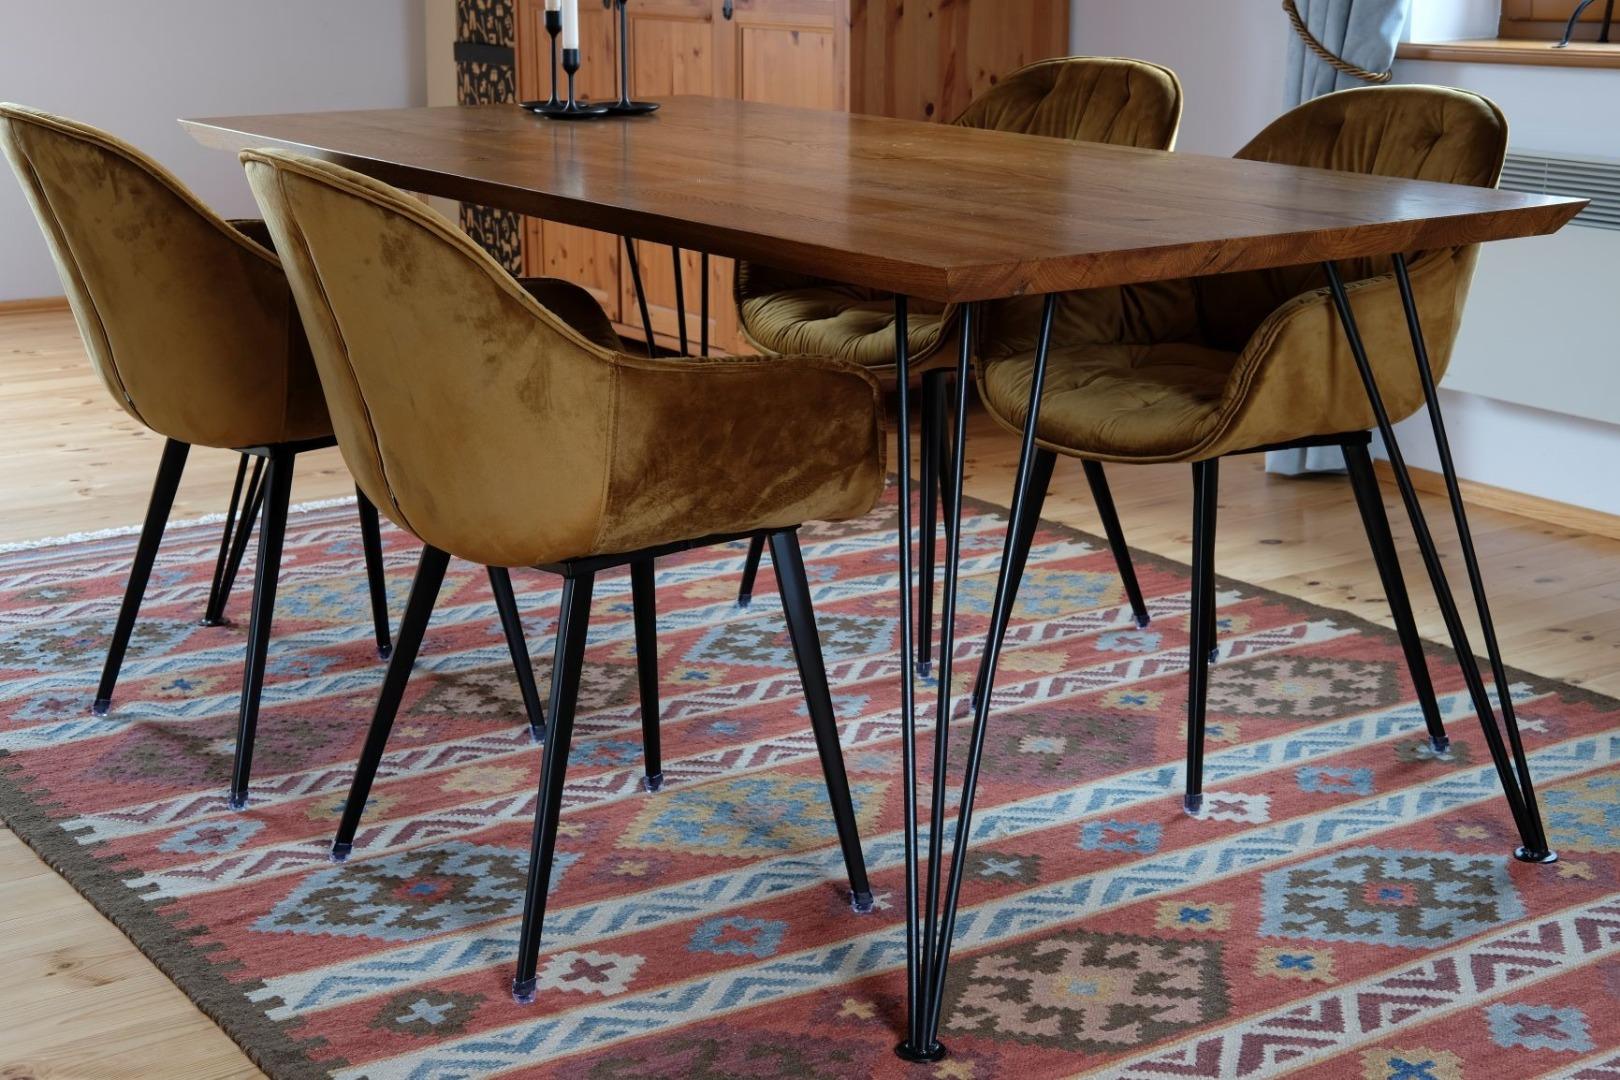 Stół na nodze Hairpin legs #1